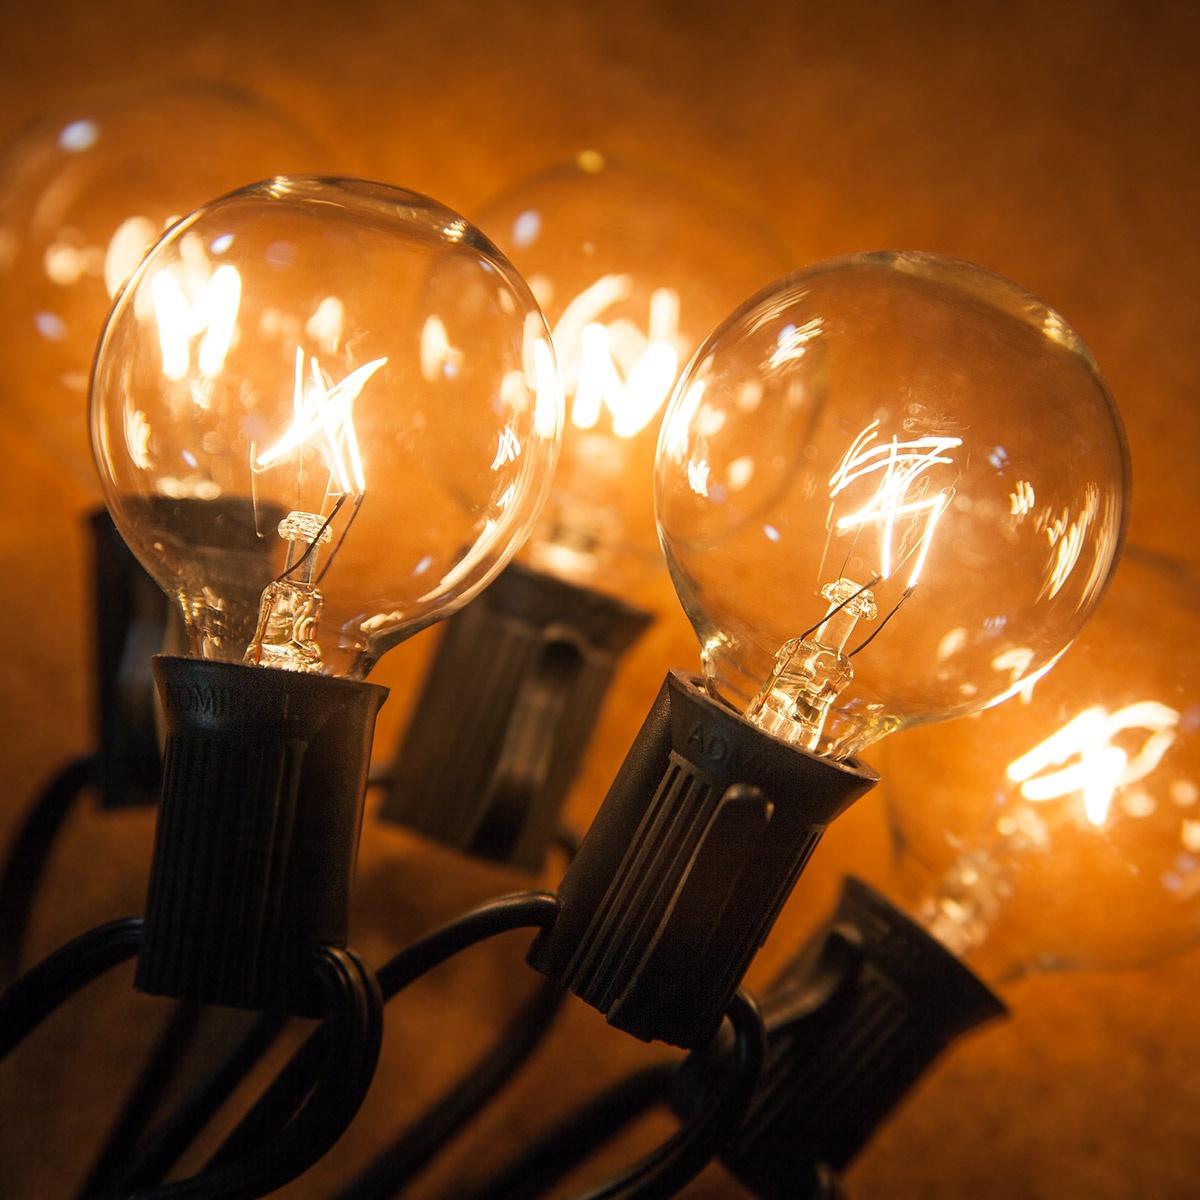 Patio Lights Clear Globe String Lights 33 G40 E12 Bulbs Black Wire